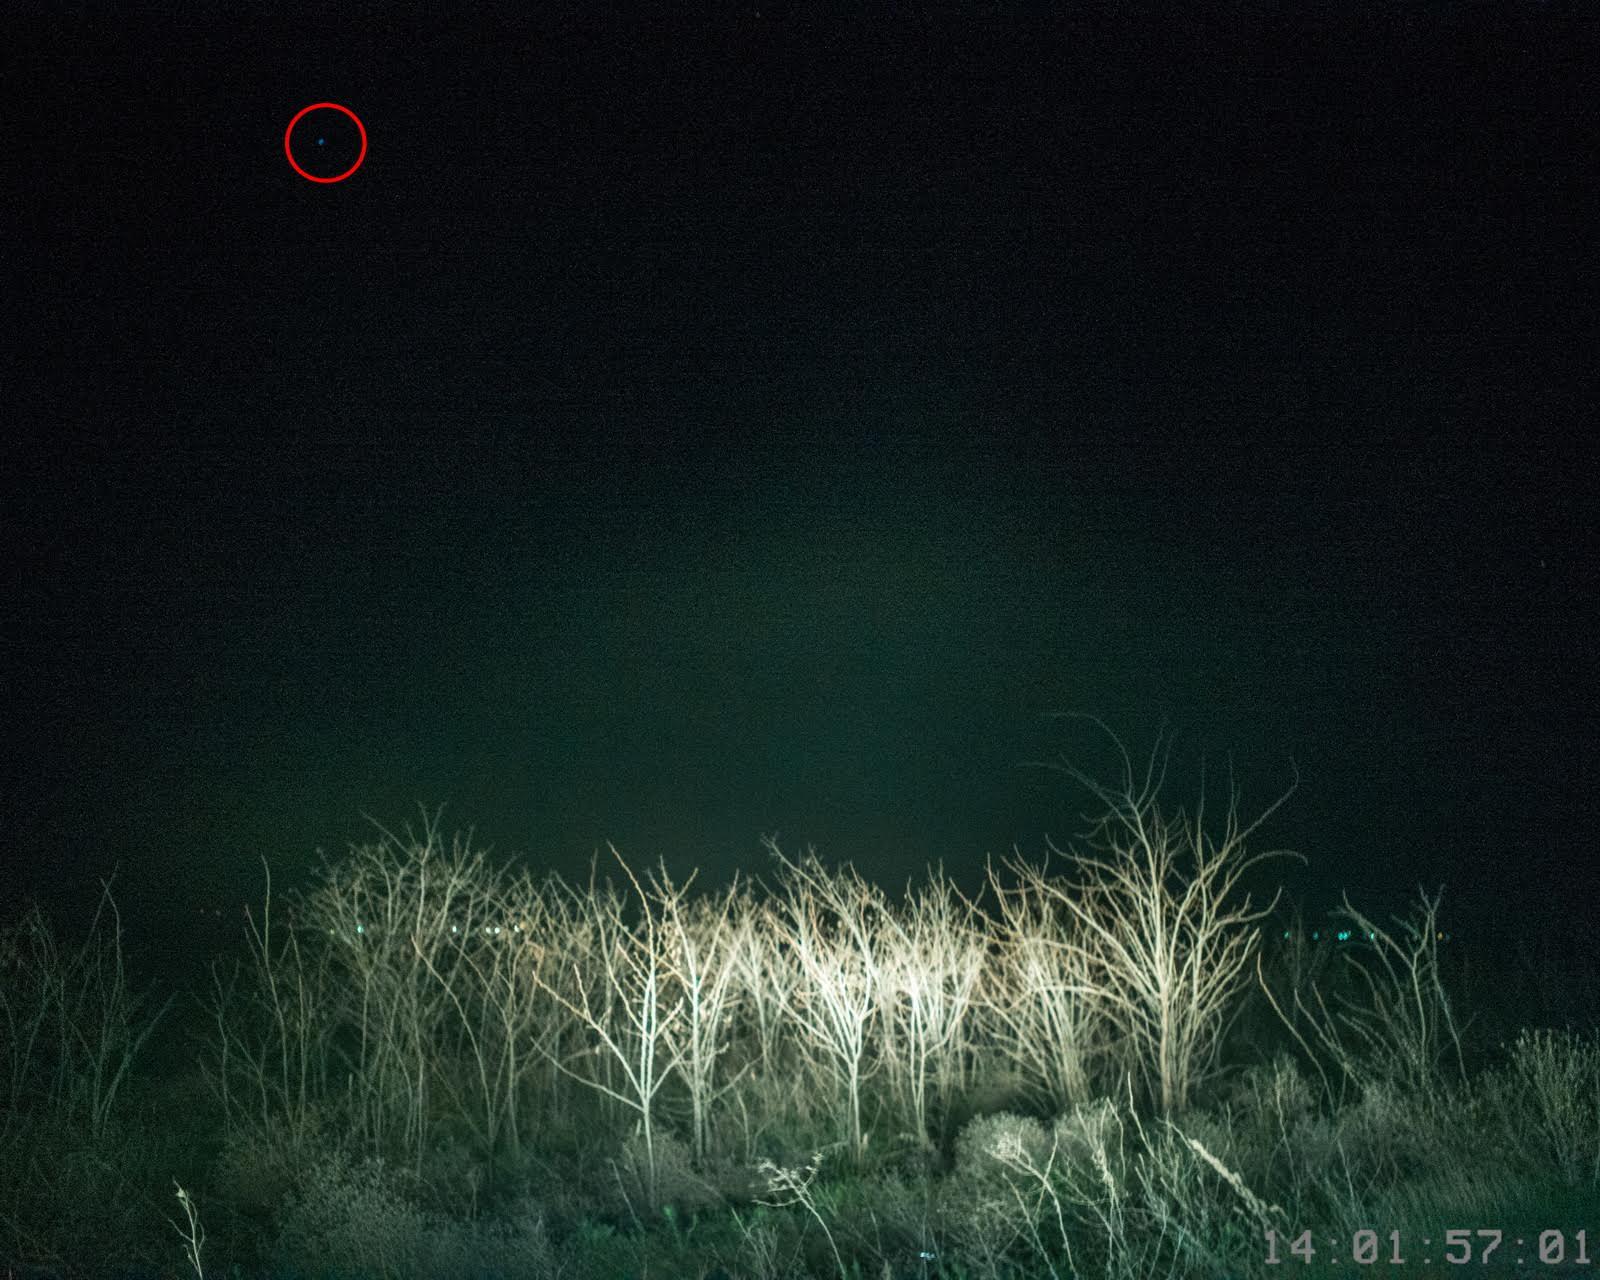 Fundamental space explorations of naked singulari_Sergey-Melnitchenko_Yogurt- Magazine20